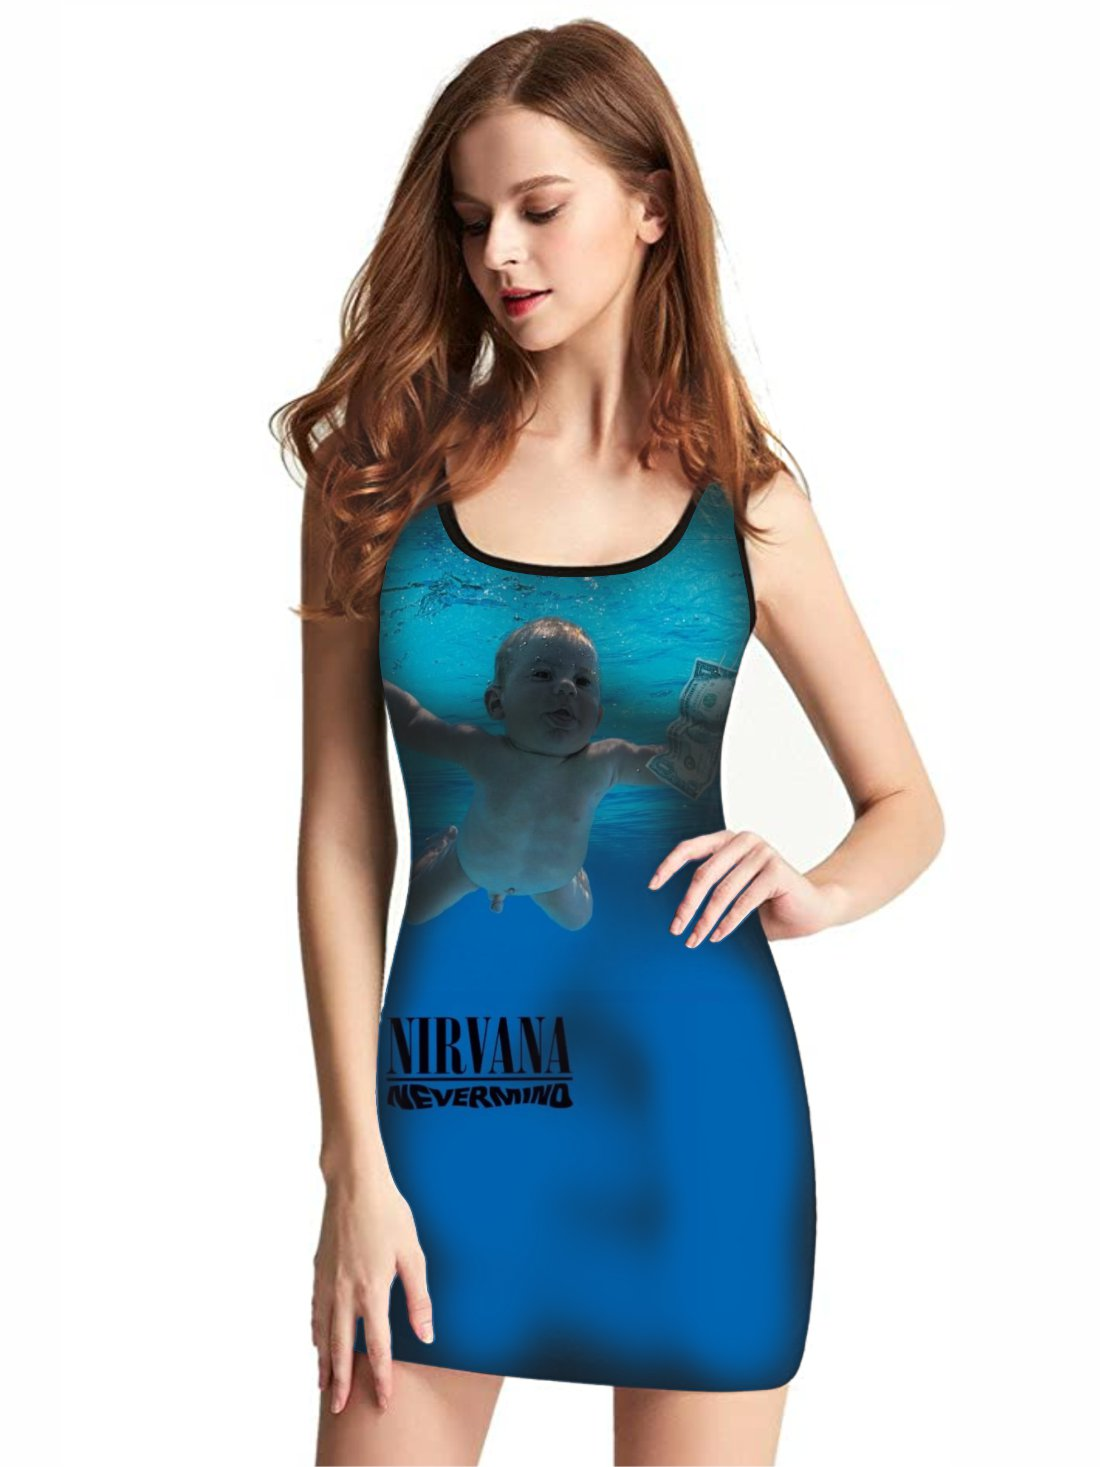 Vestido Feminino Full Printed Banda Nirvana Nevermind FP_025